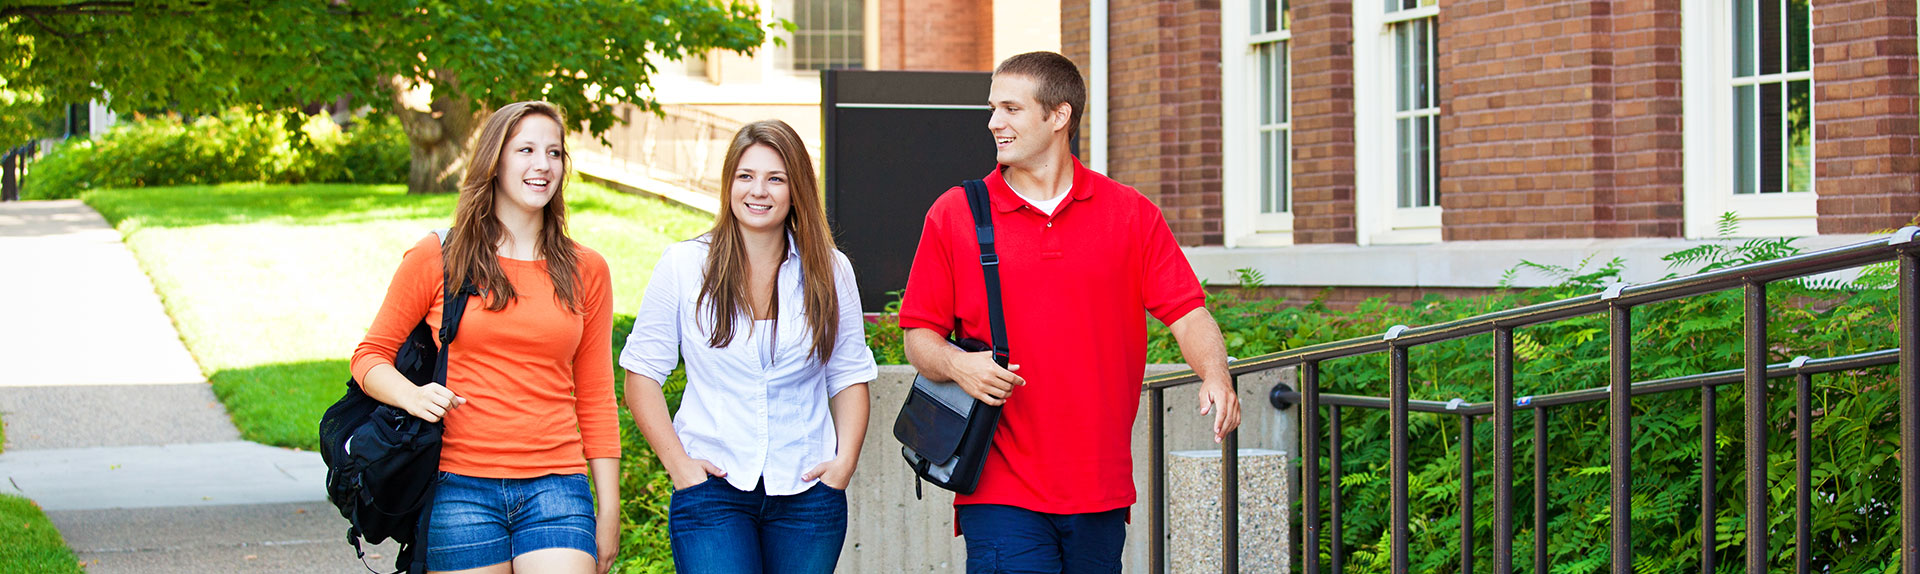 George Washington University of Melrose Georgetown, Washington